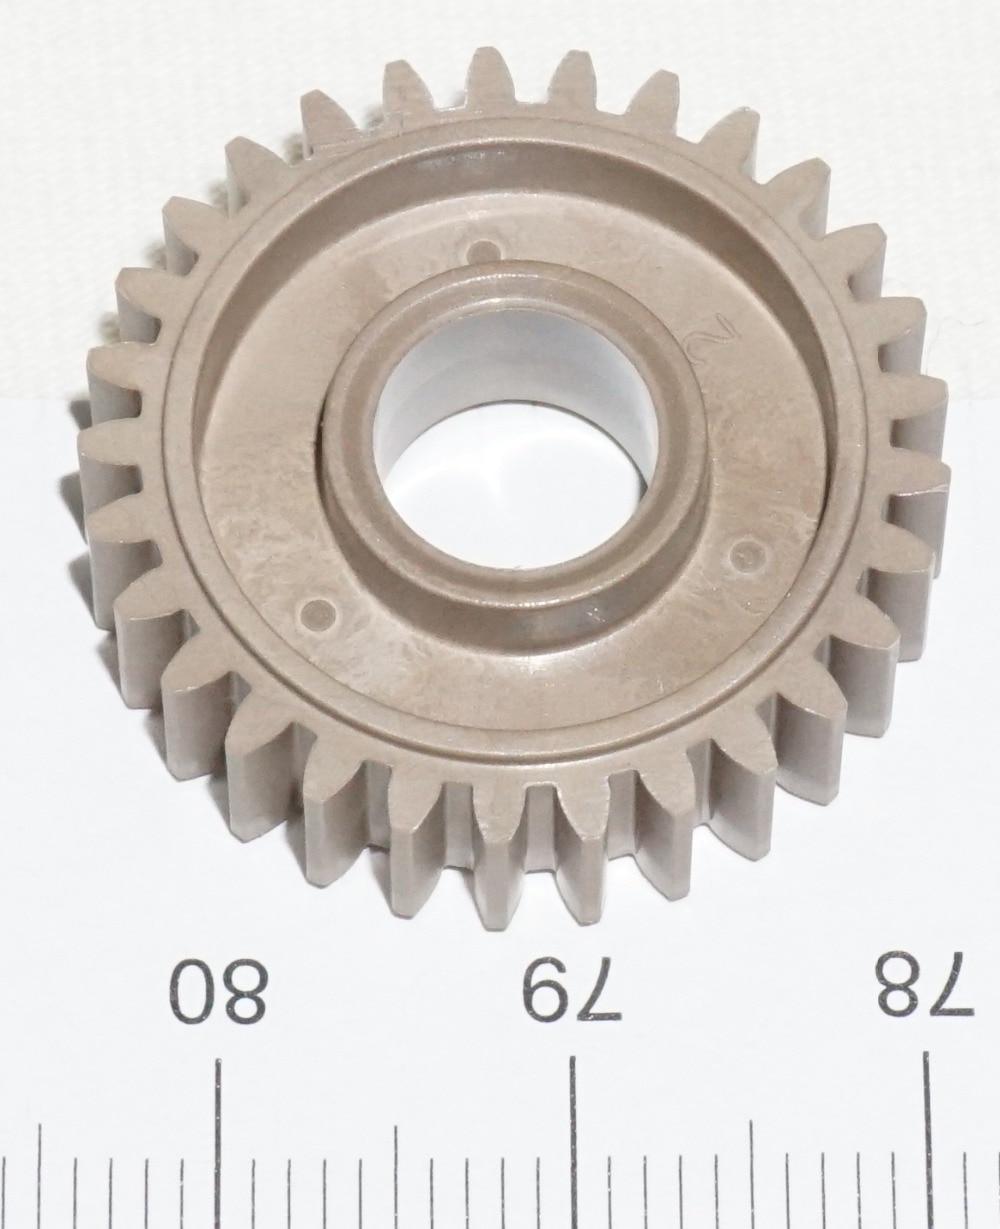 New Original Kyocera GEAR IDLE Z29S (in Fuser) for:FS-1040 1060 1020 1120 1025 1125 new original kyocera fuser 302j193050 fk 350 e for fs 3920dn 4020dn 3040mfp 3140mfp